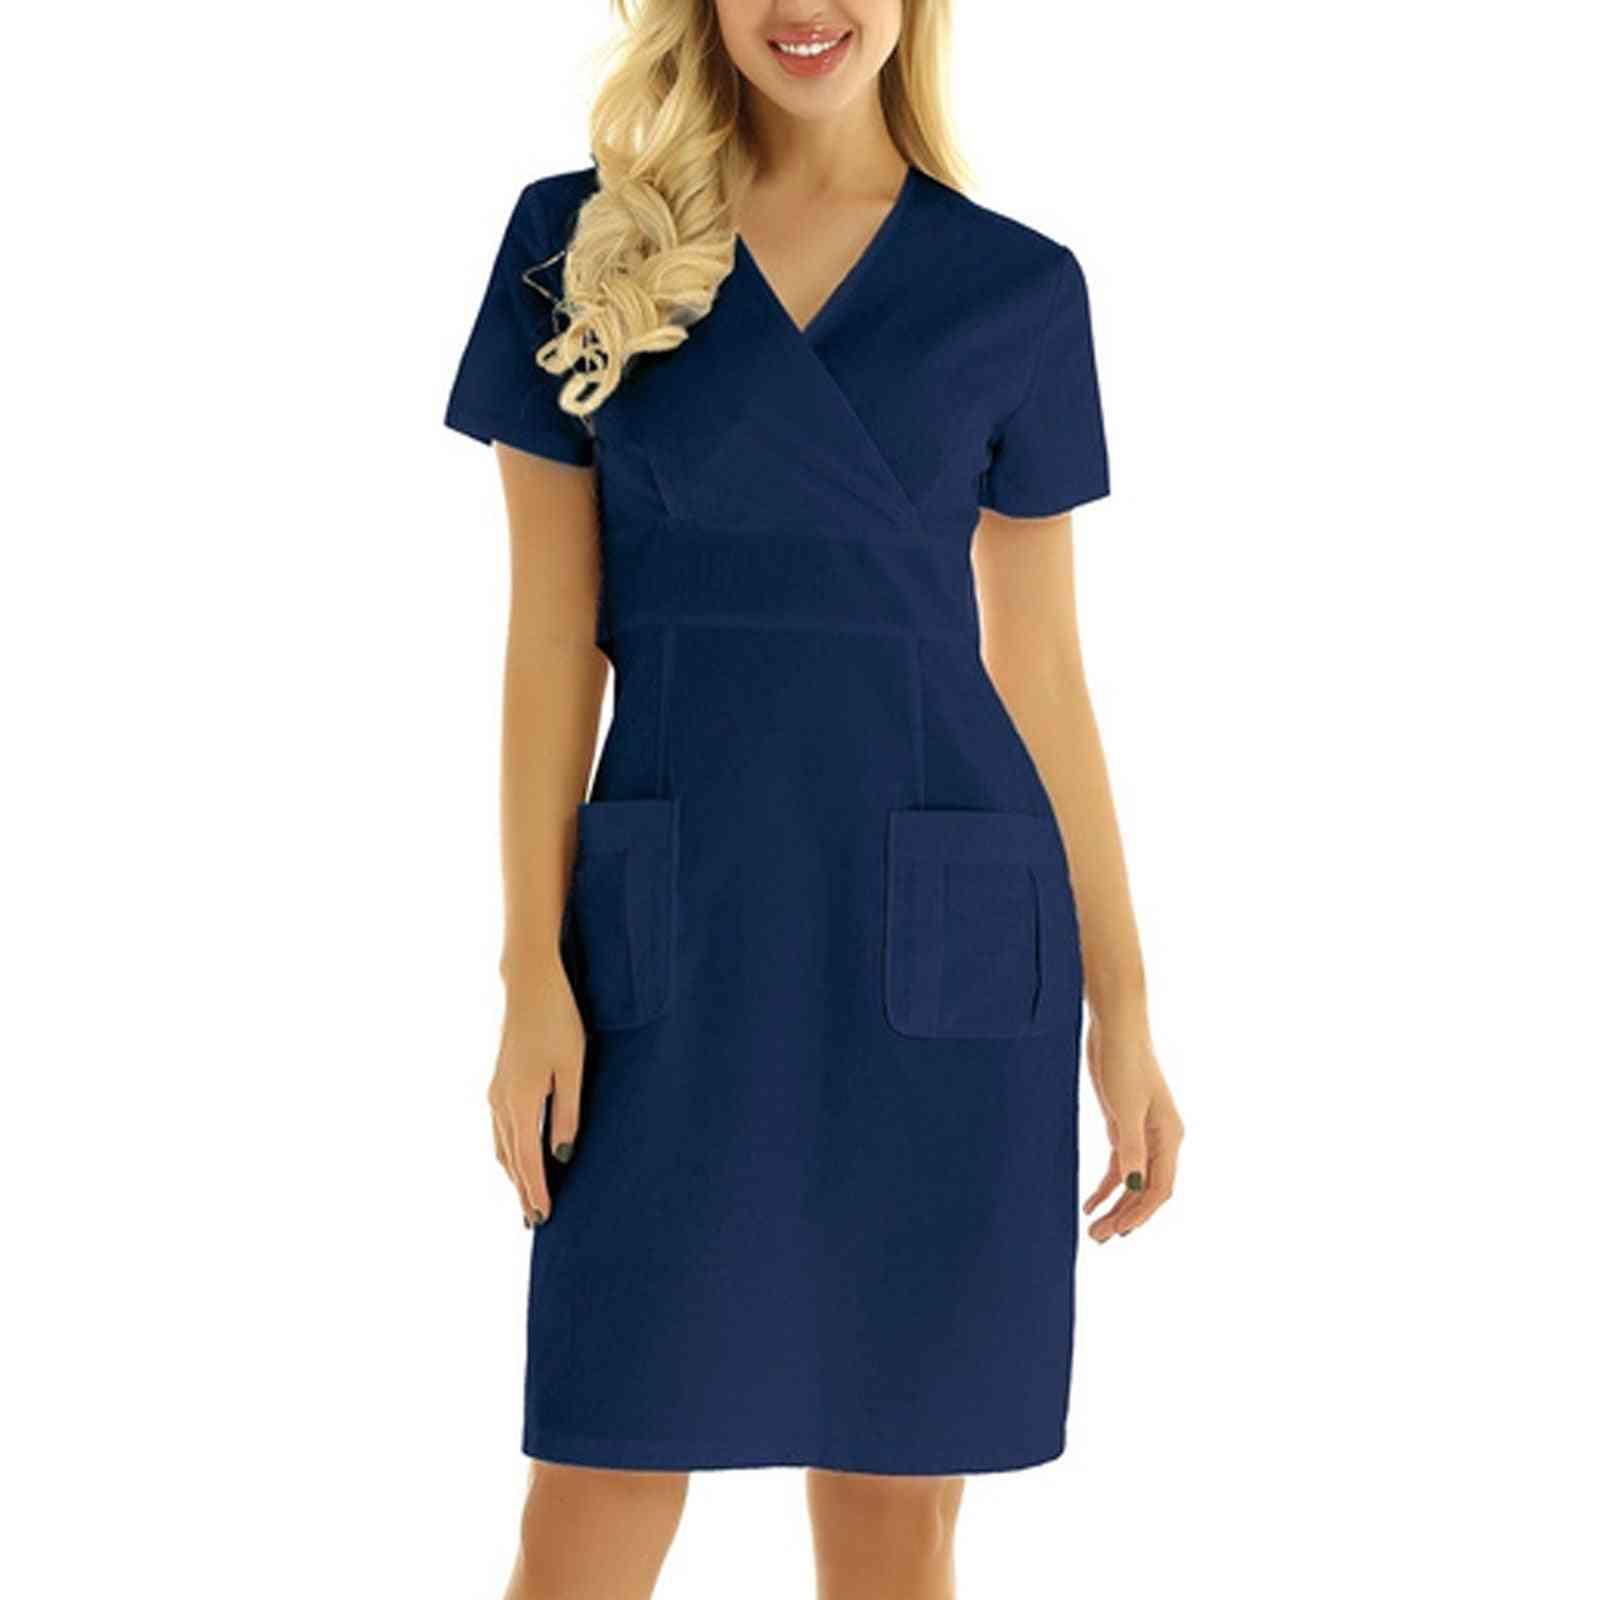 Women Shirt Dress Nurse Uniform Short Sleeve V-neck Solid Working Uniform